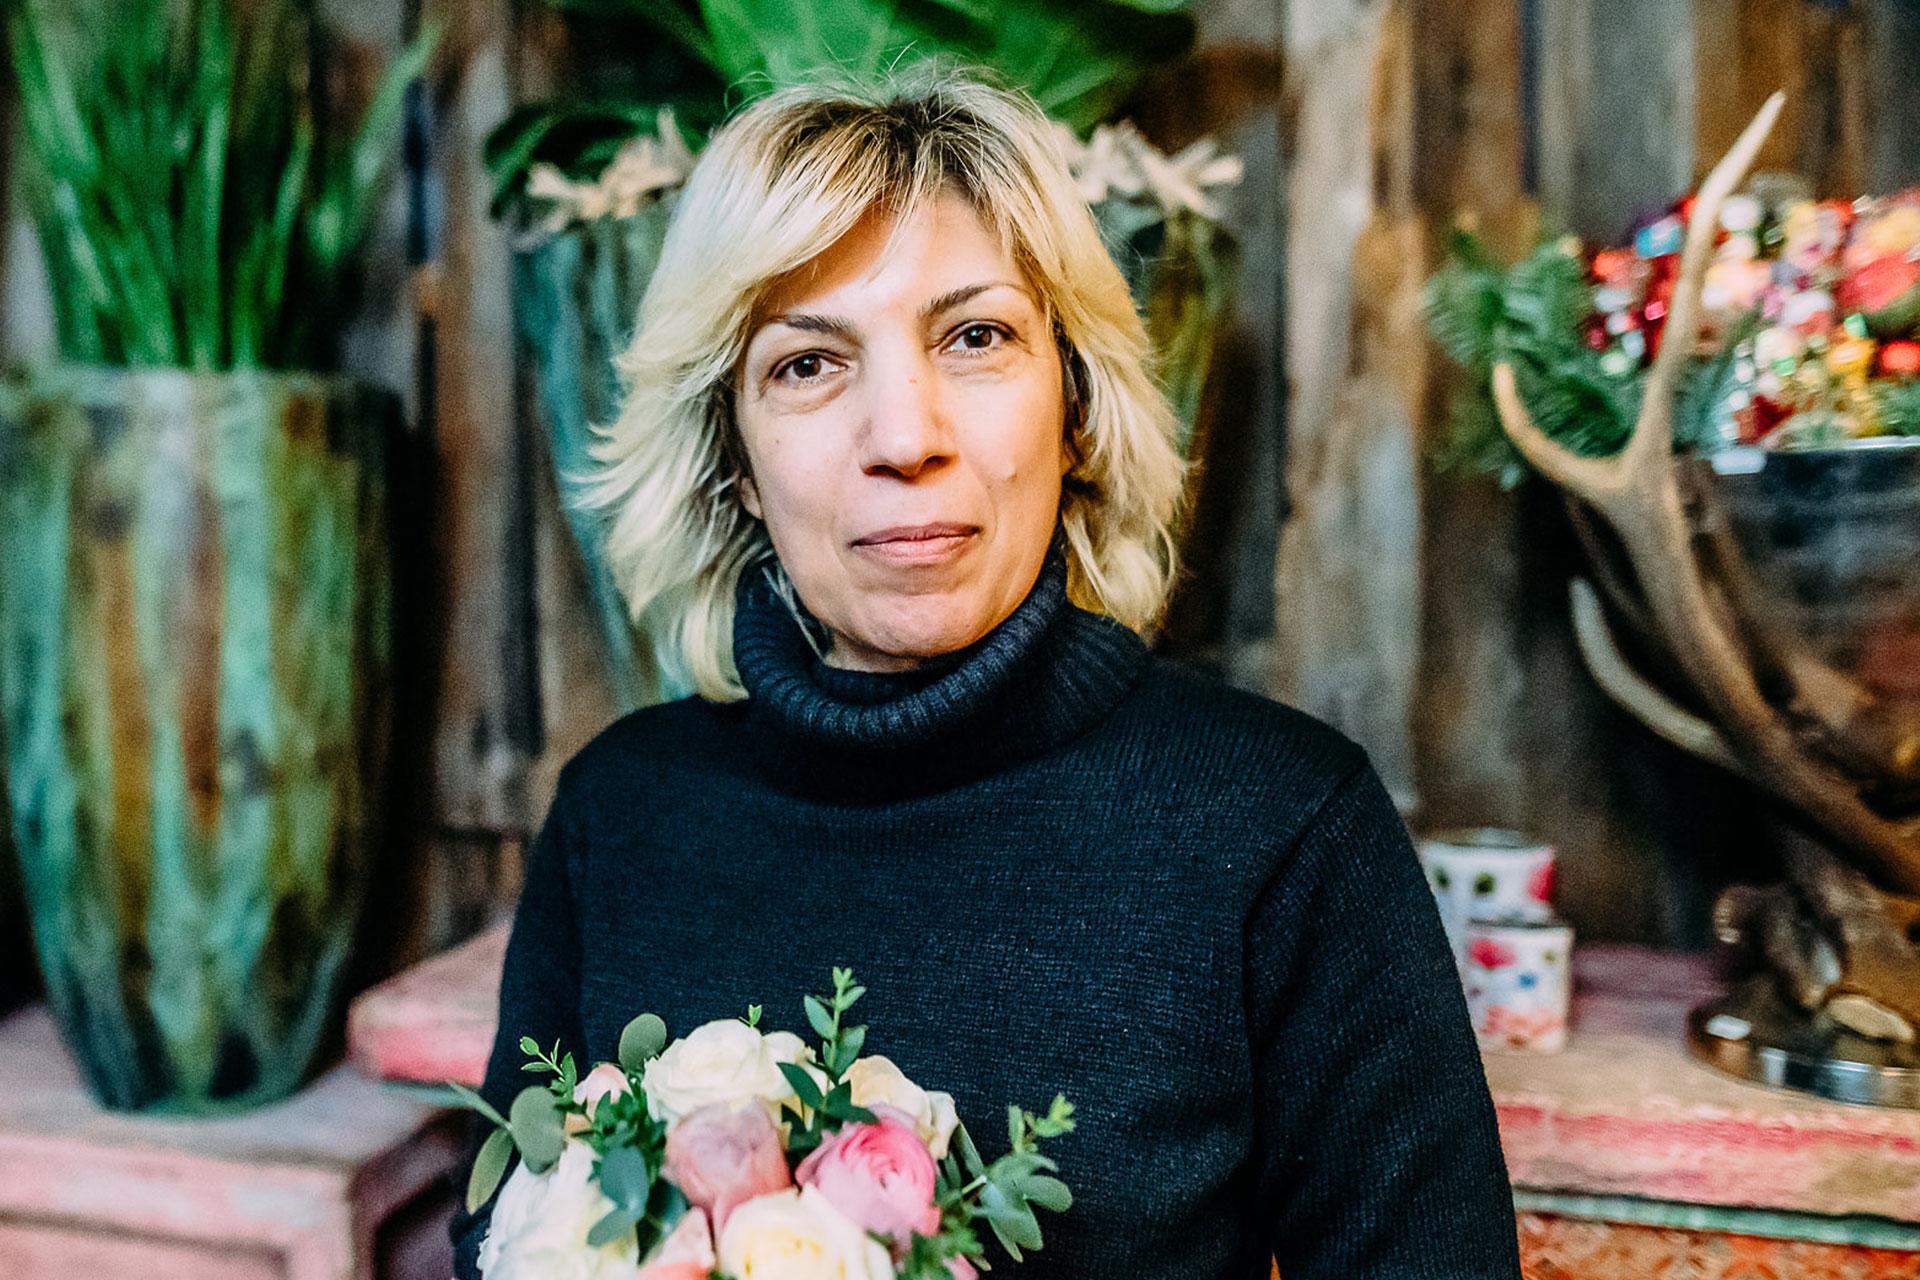 Christina Moysiadou